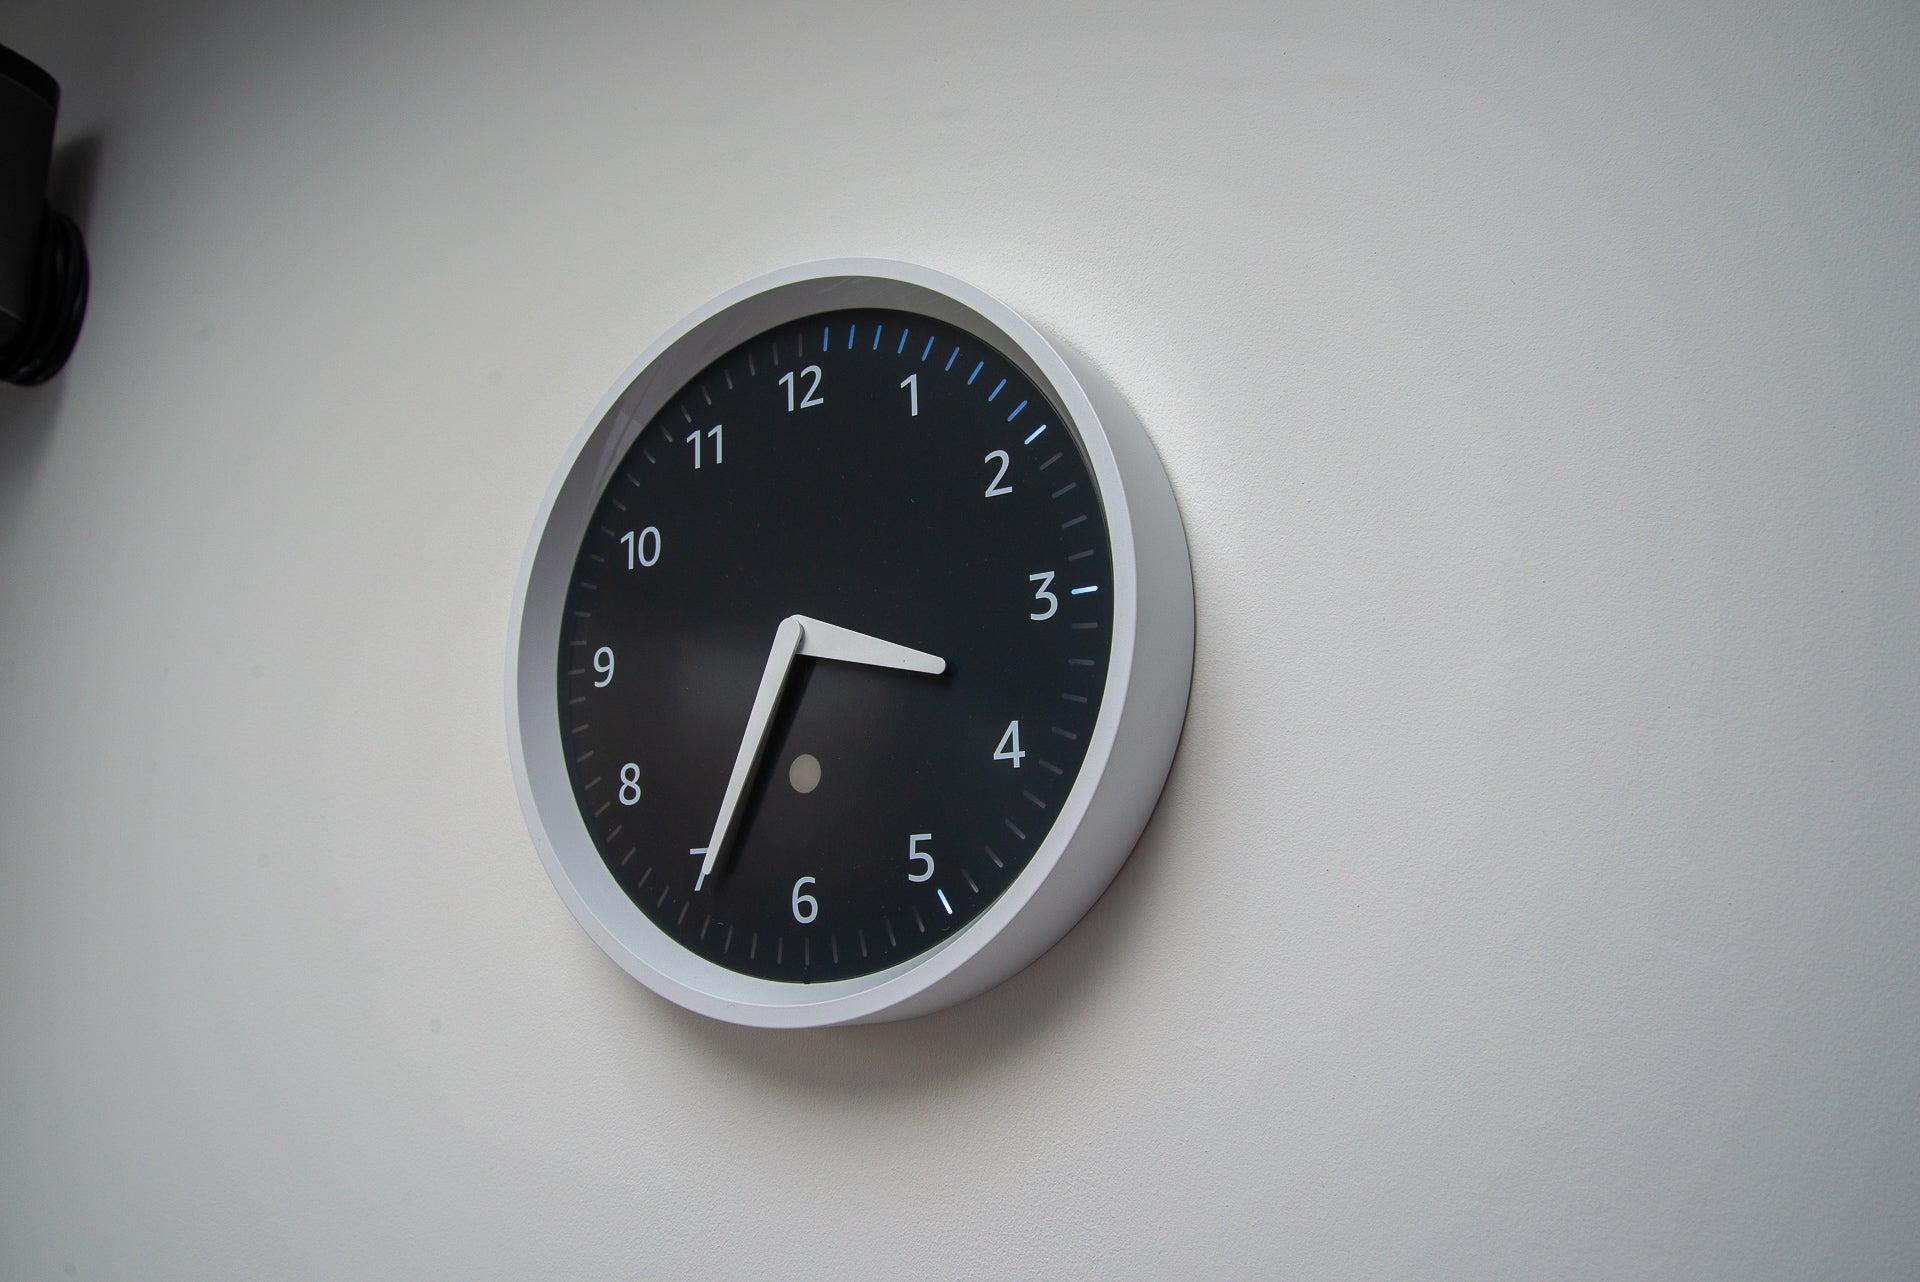 Amazon Echo three-timer wall clock